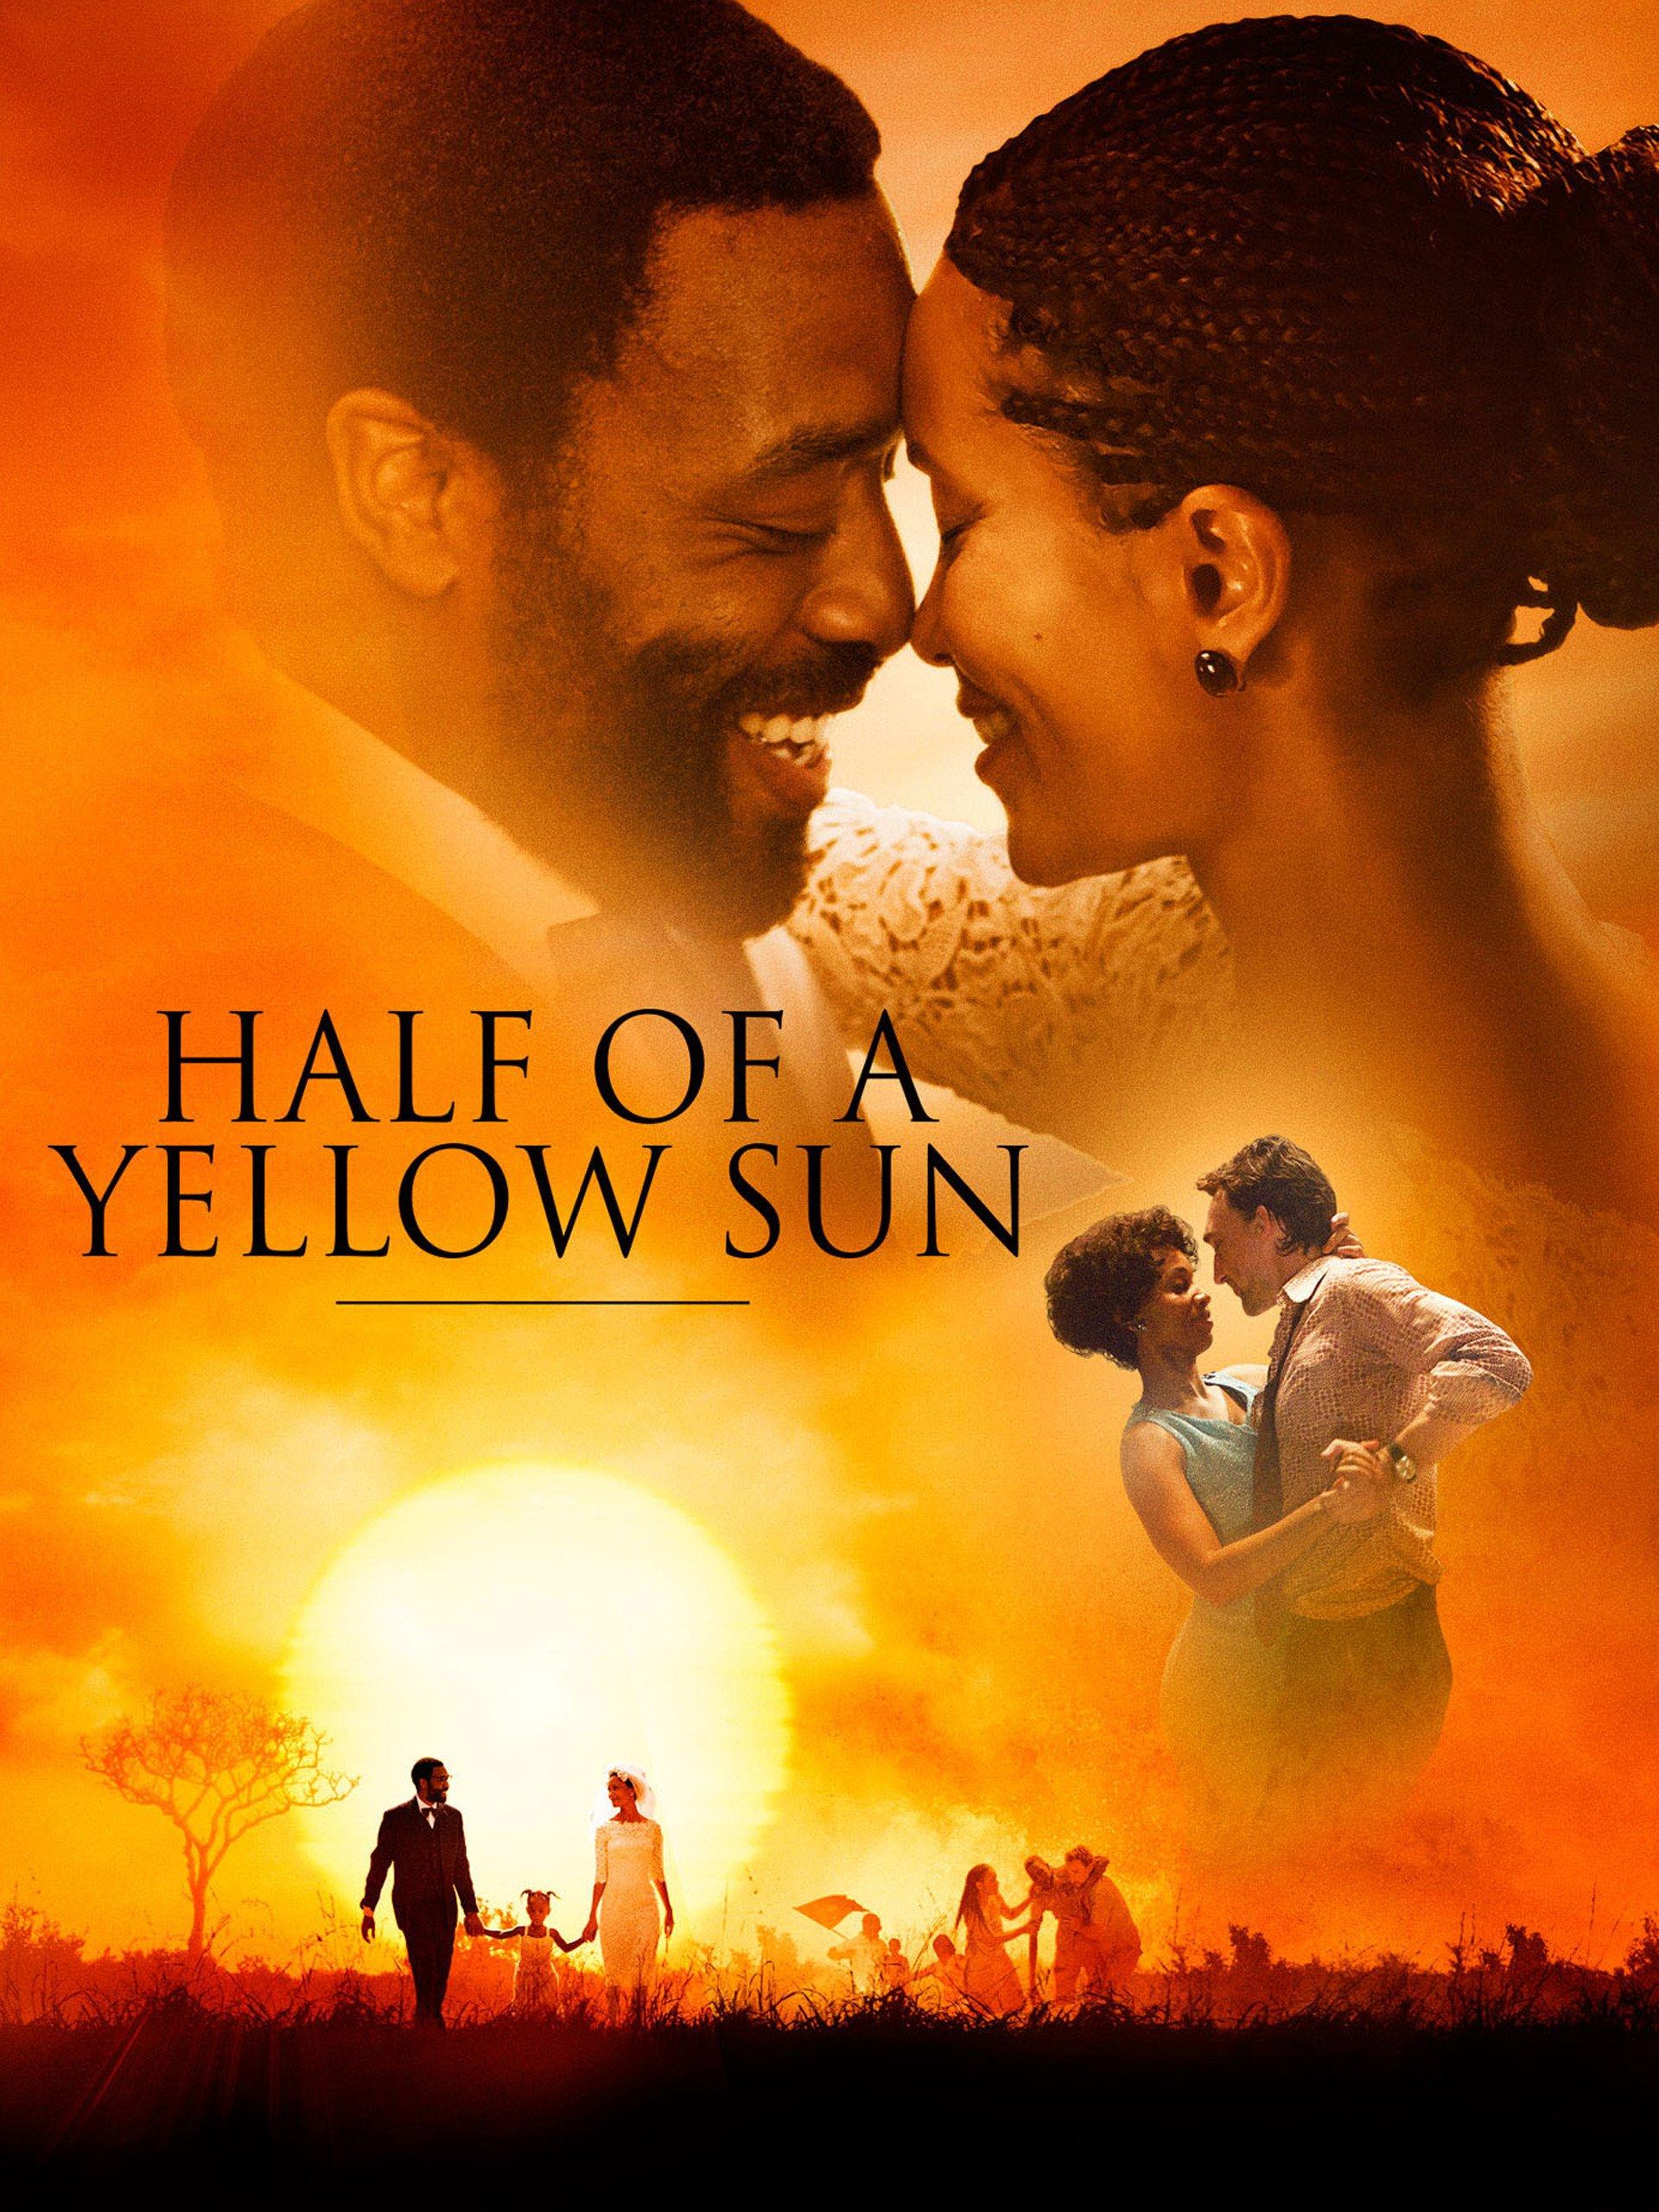 Amazon co uk: Watch Half of A Yellow Sun | Prime Video